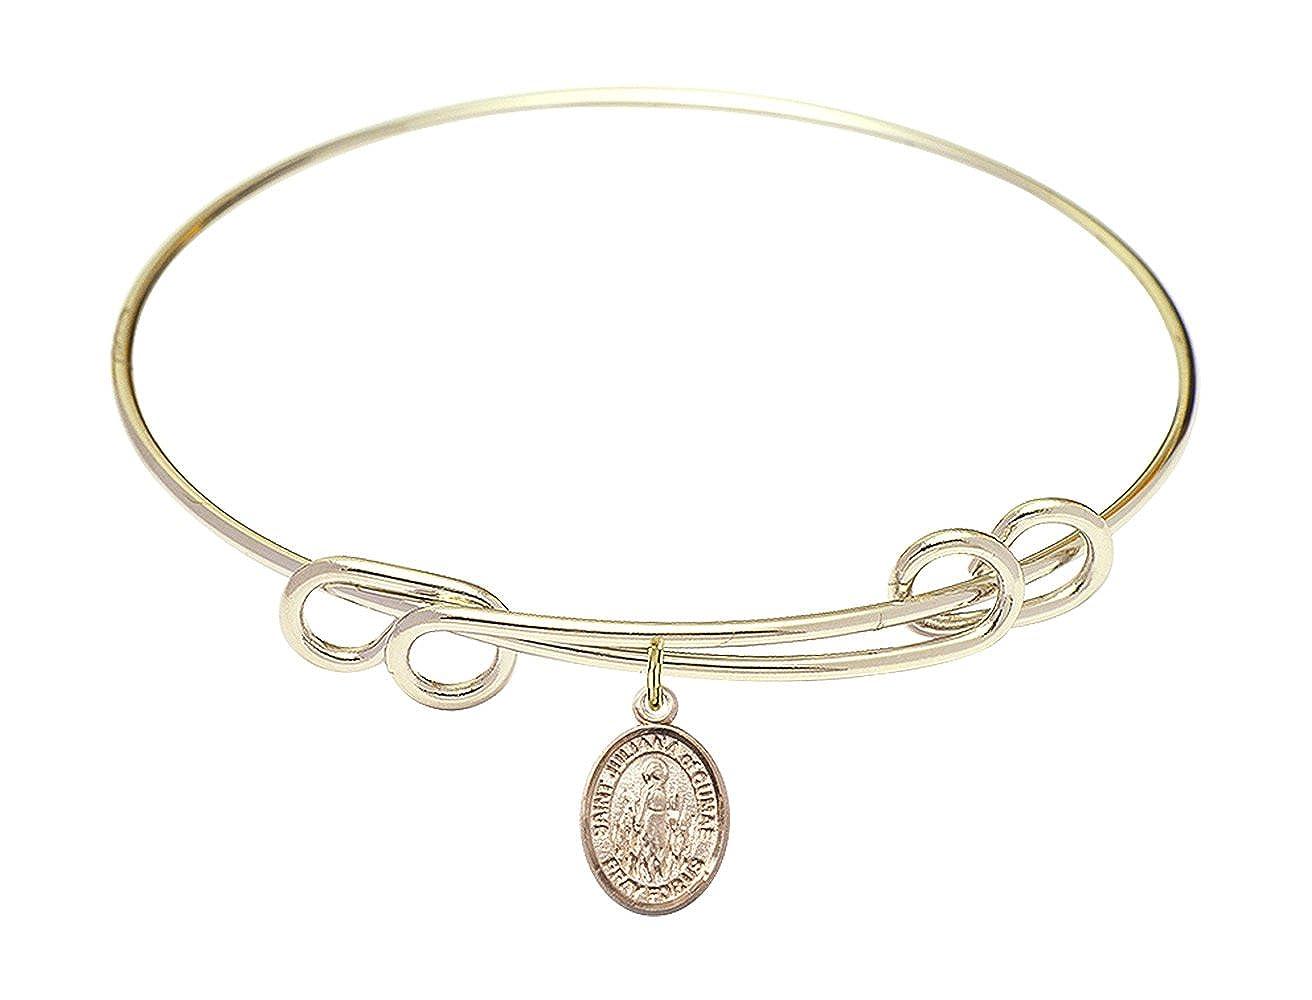 DiamondJewelryNY Double Loop Bangle Bracelet with a St Juliana of Cumae Charm.